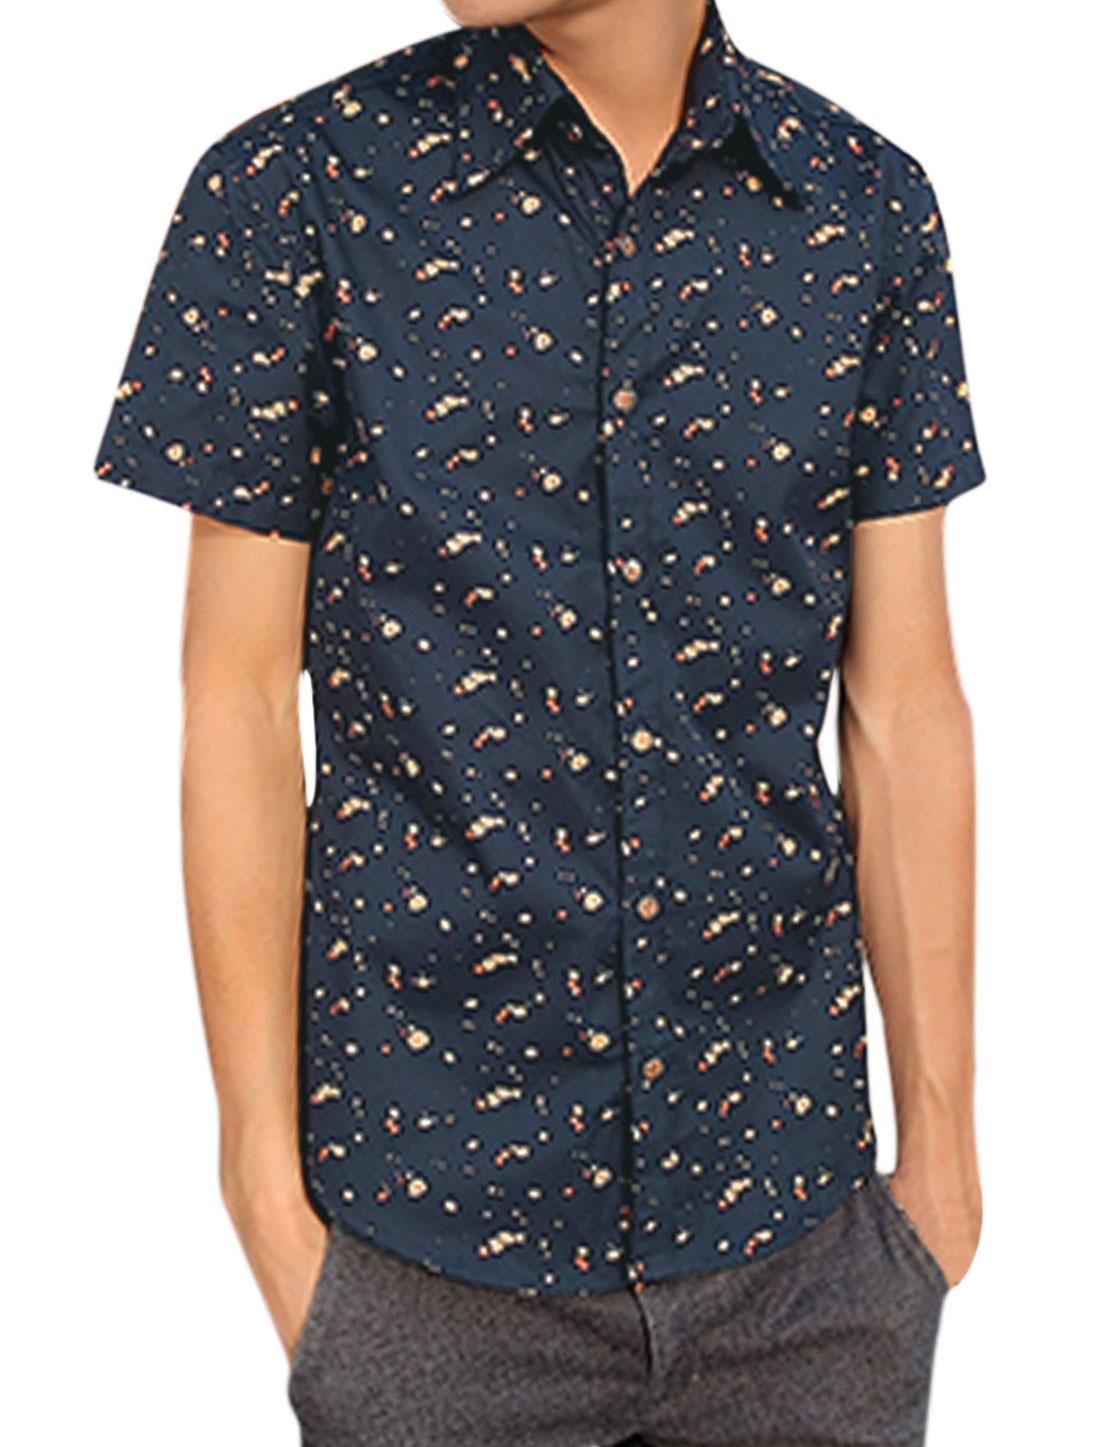 Men Short Sleeve Novelty Print Button Down Shirts Navy Blue S